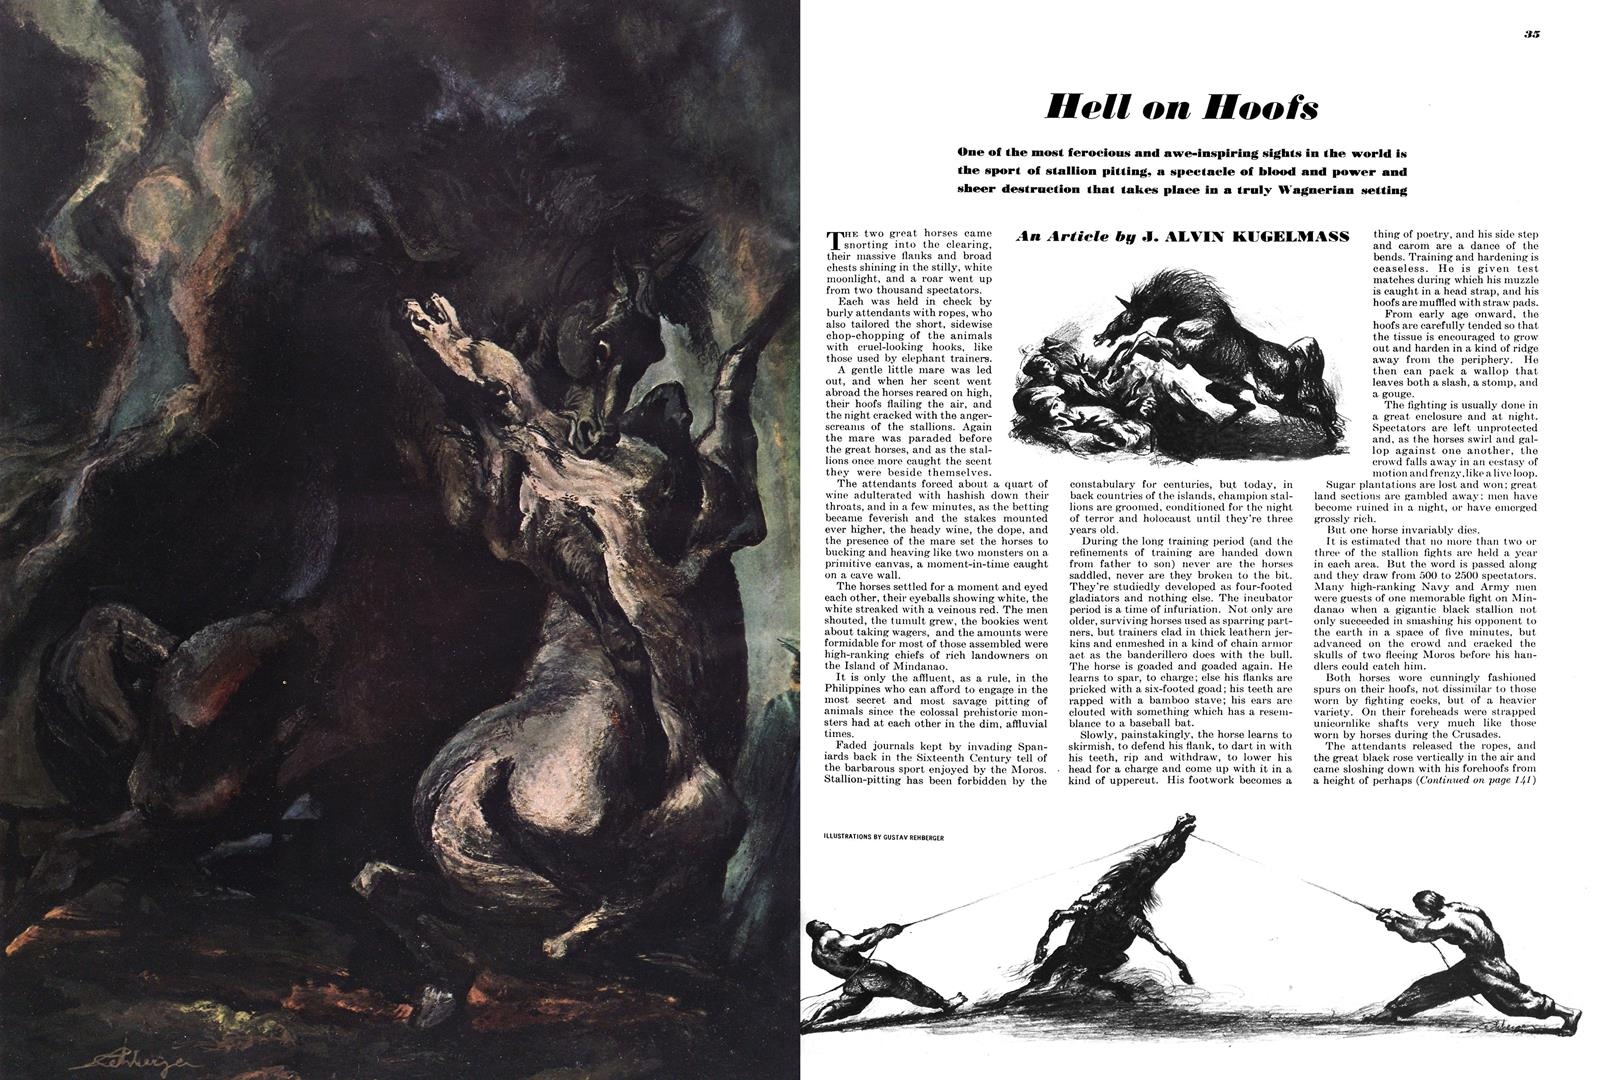 July 1948 - Hell on Hoofs